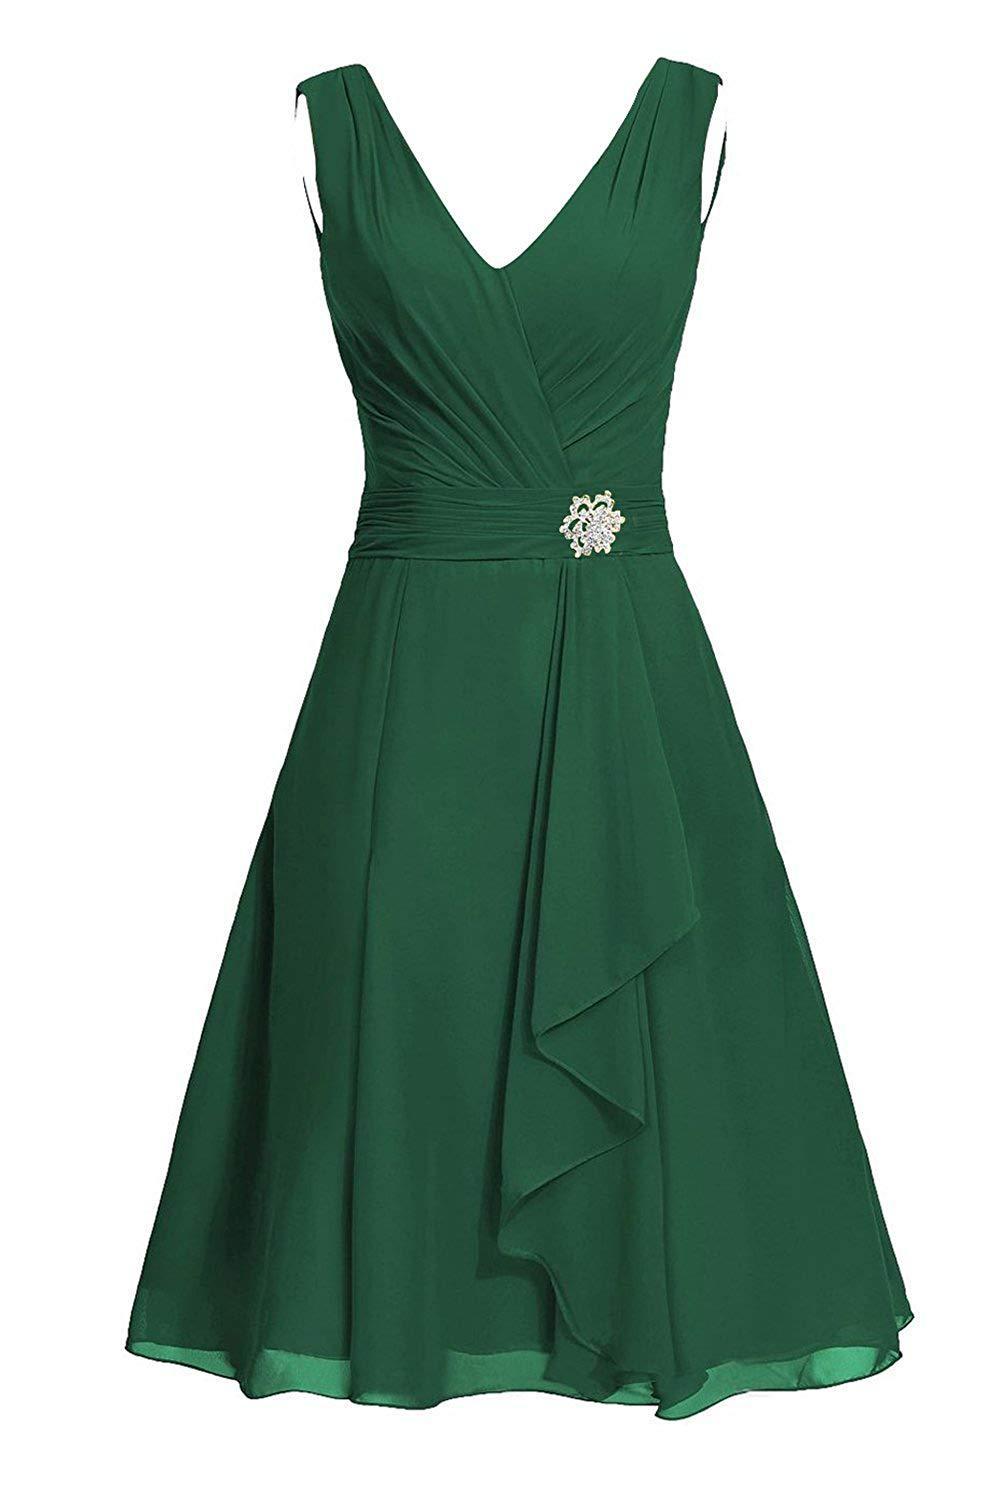 Short Elegant Hot Chiffon V-Neck Crystals Beaded   Cocktail     Dresses   Short Homecoming   Dress   Formal Gown Ilbies tal-koktejl